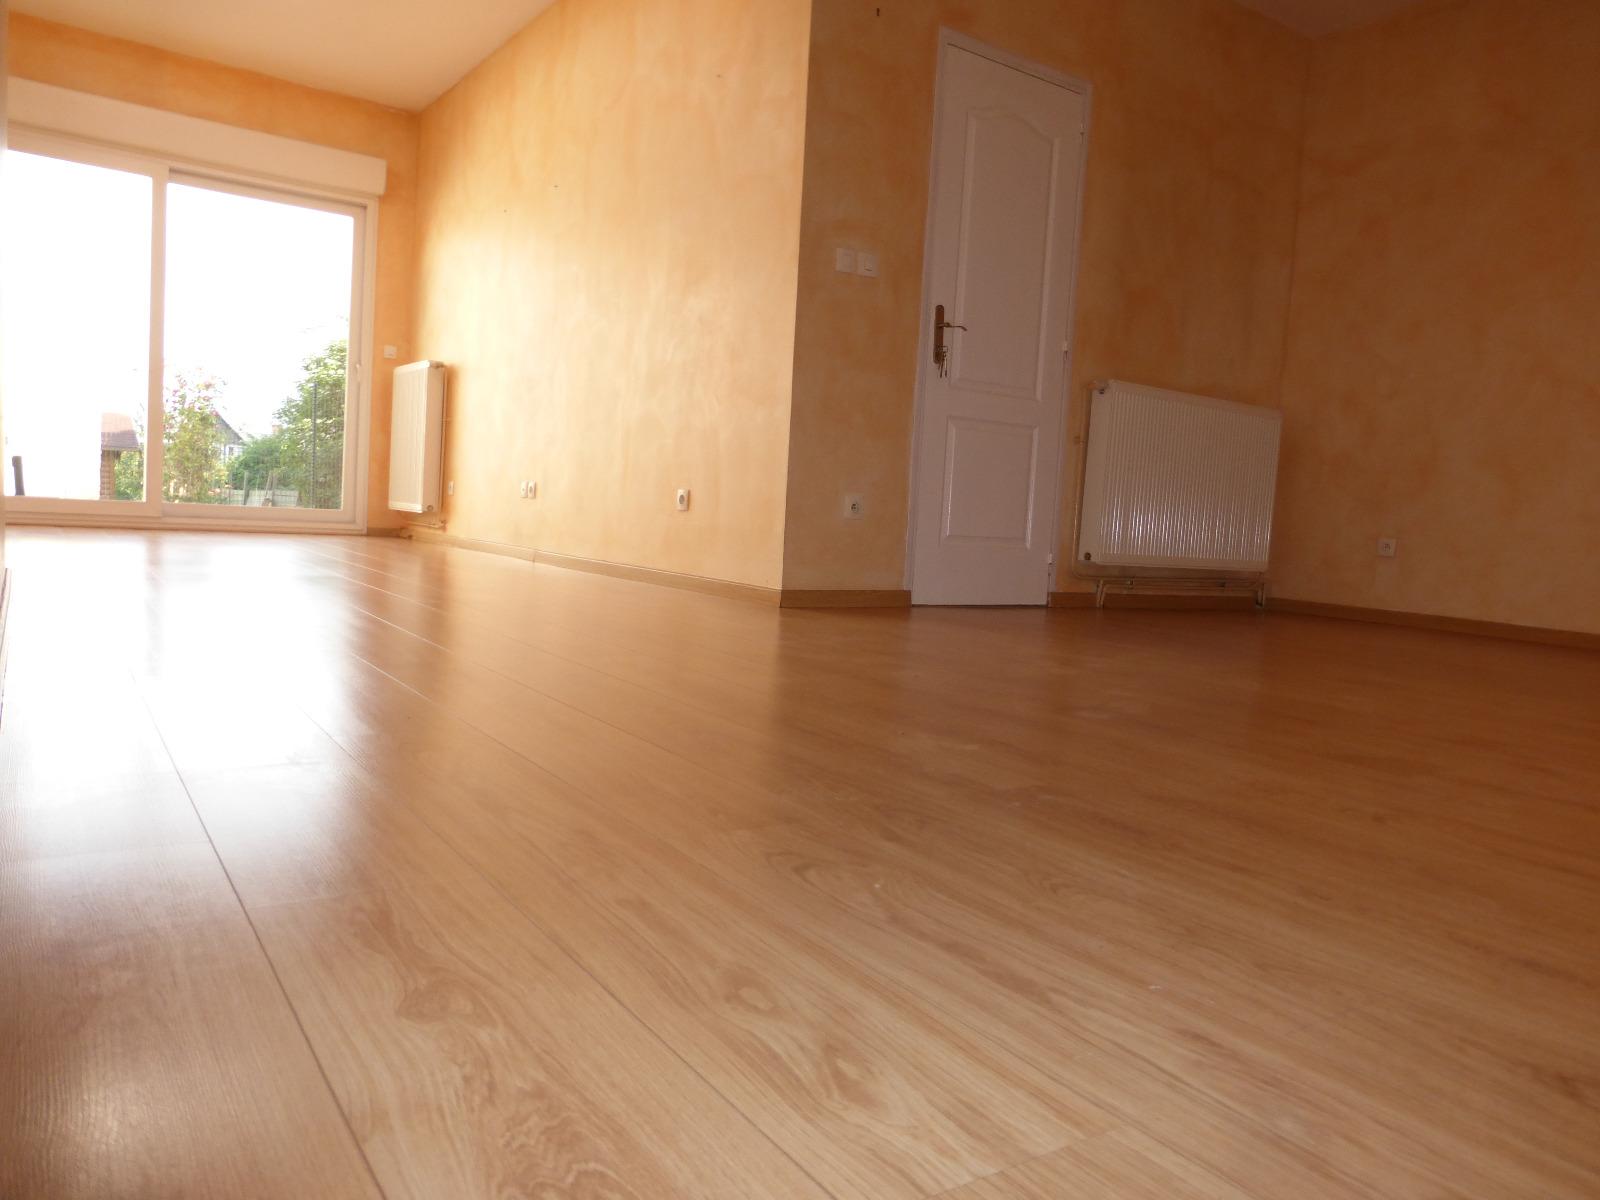 Maison r nov e avec 4 chambres jardin et garage for Location garage henin beaumont